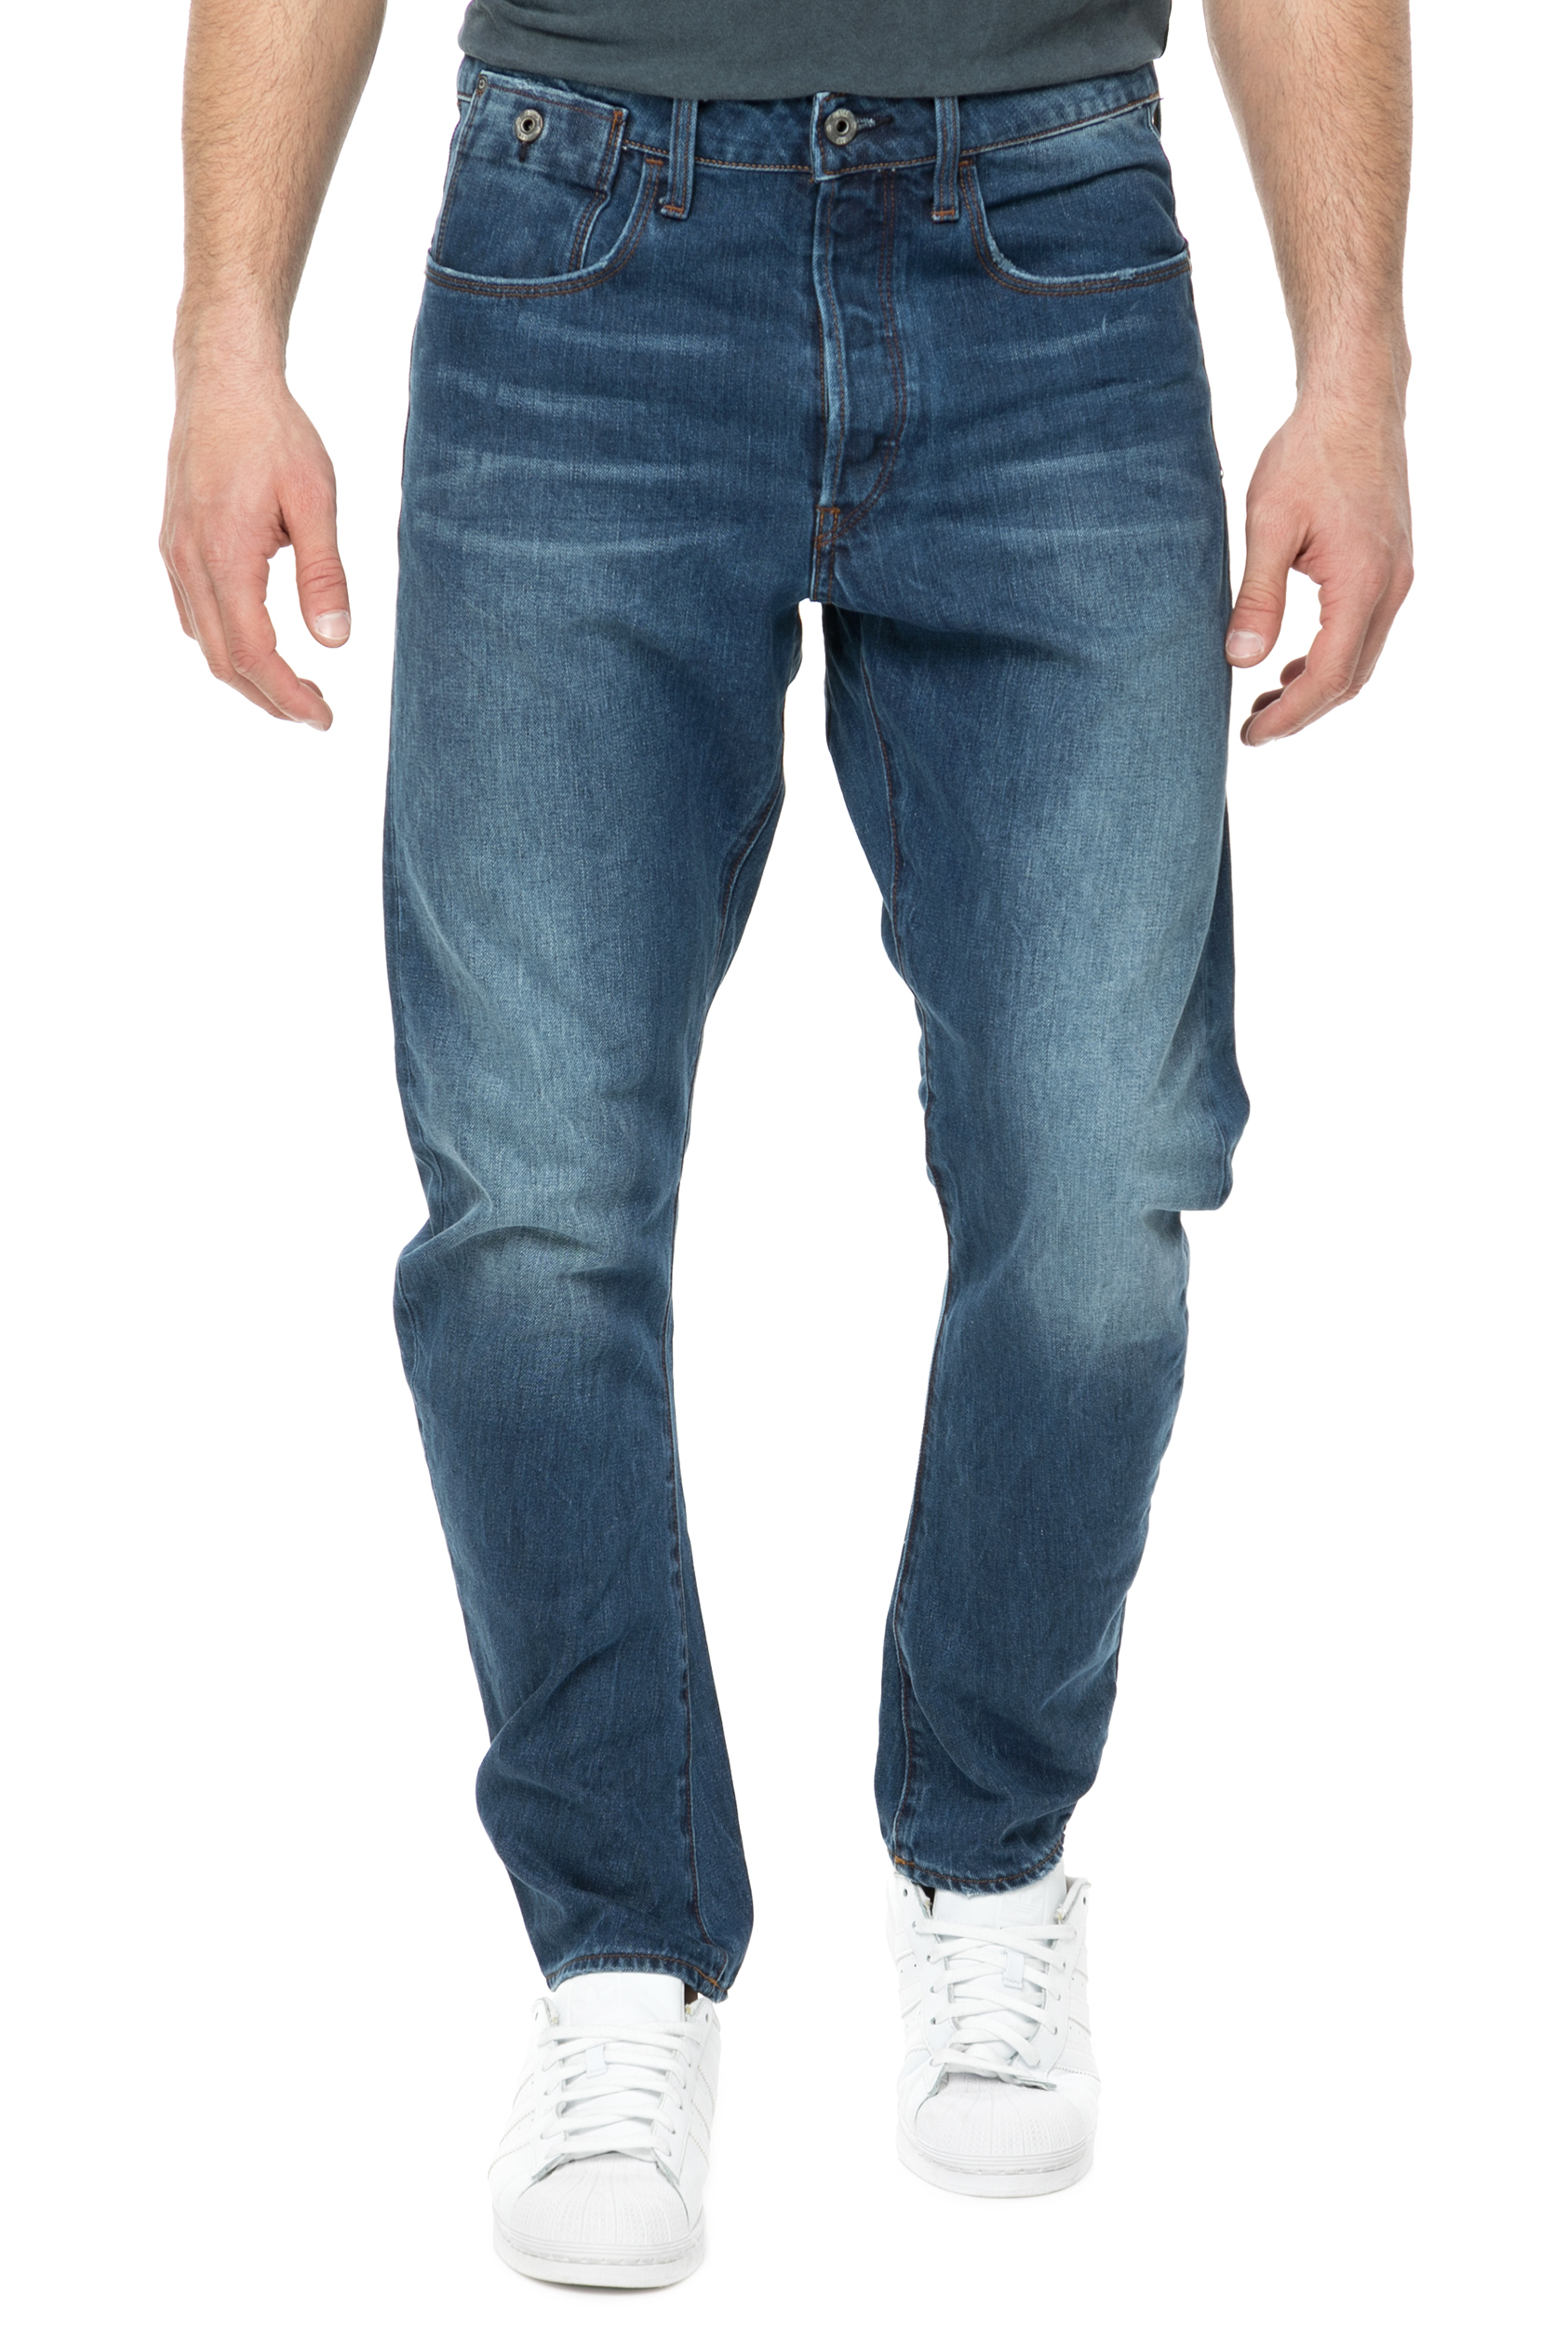 3c96383835b7 G-STAR RAW - Ανδρικό τζιν παντελόνι G-STAR RAW 3d tapered μπλε